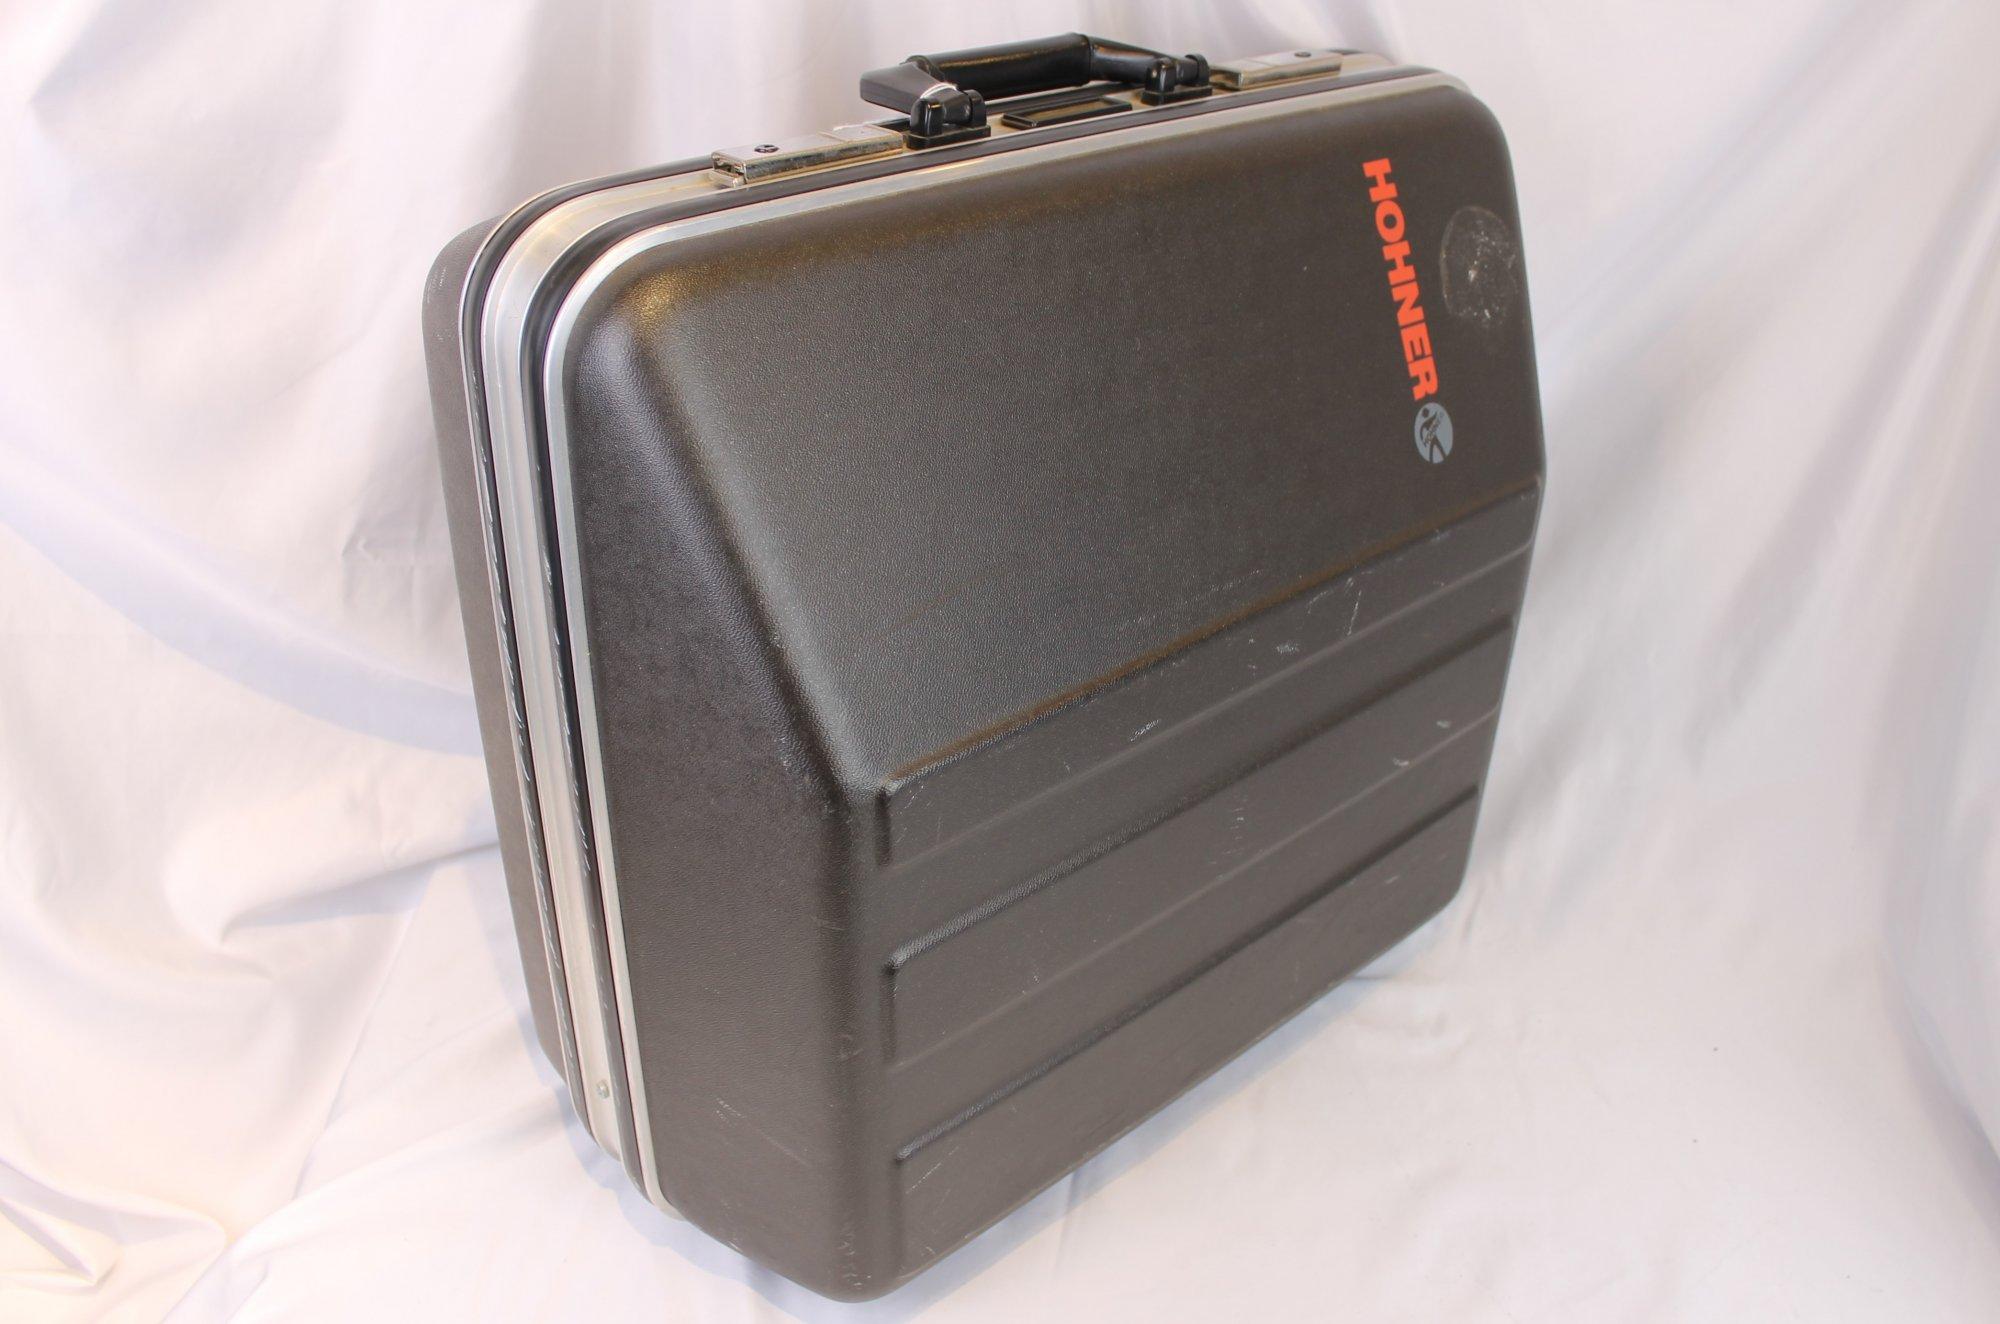 Black Hohner Hard Case for Accordion 19 x 16 x 8